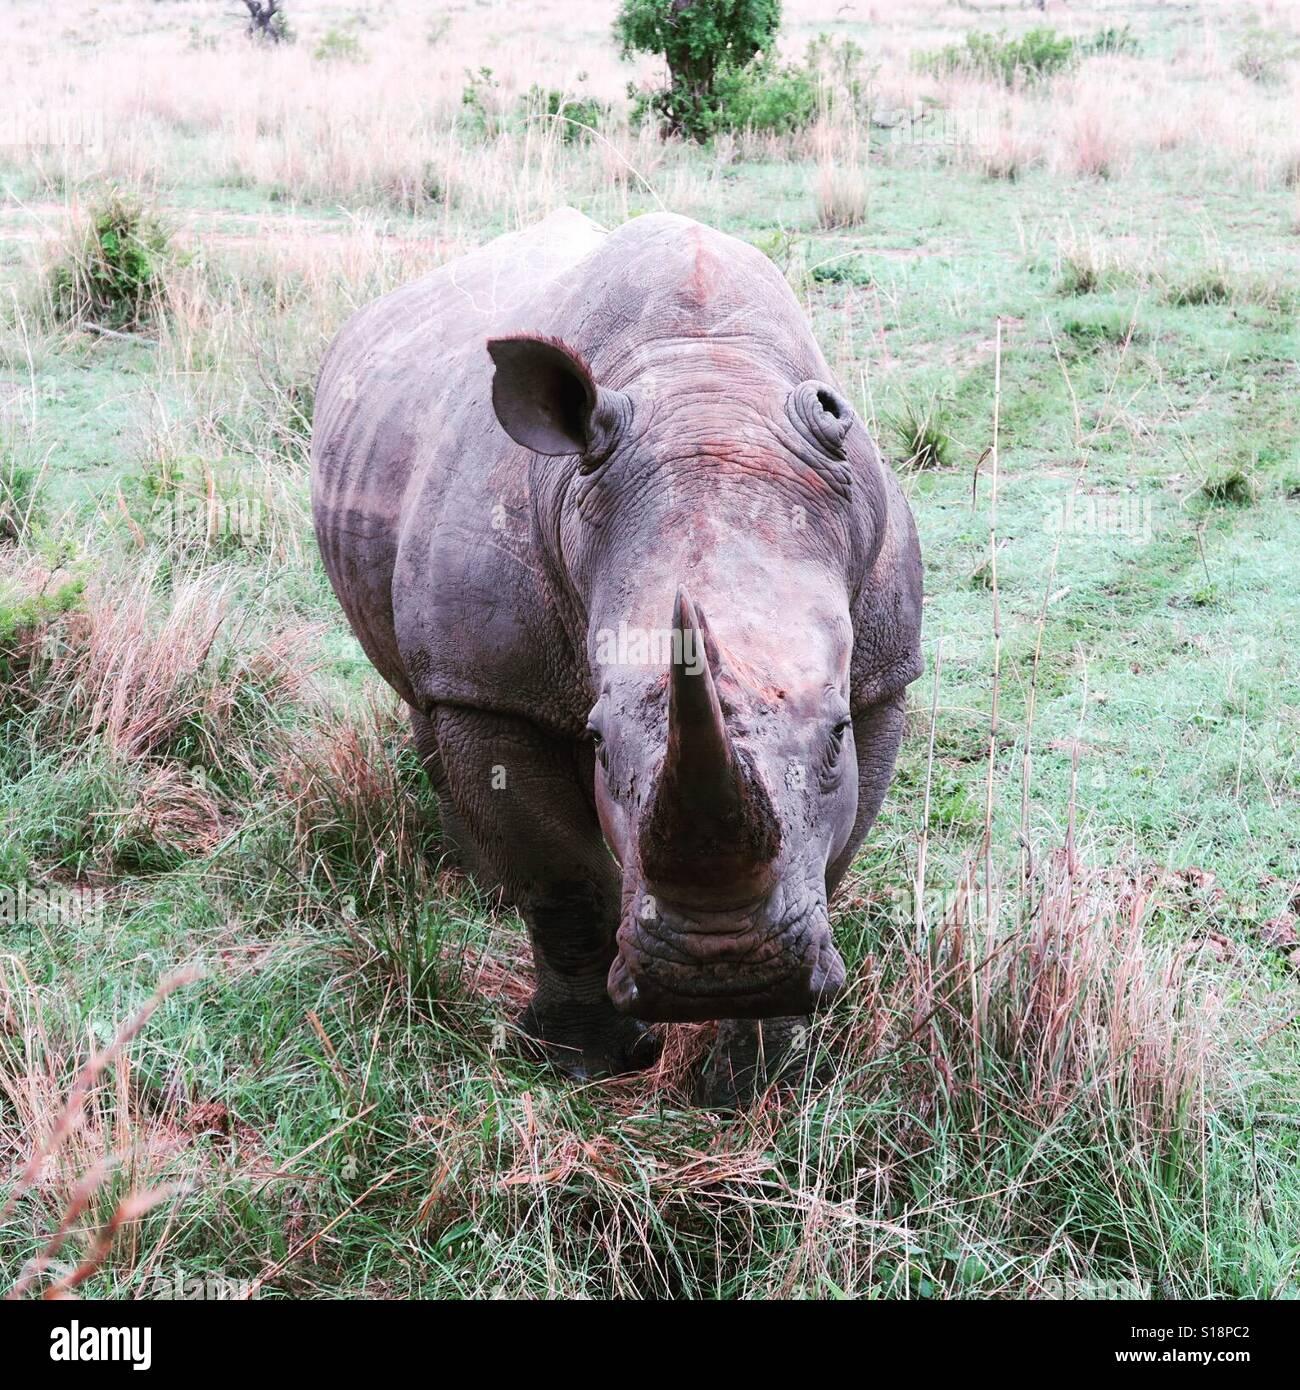 A male white rhino approaching. - Stock Image